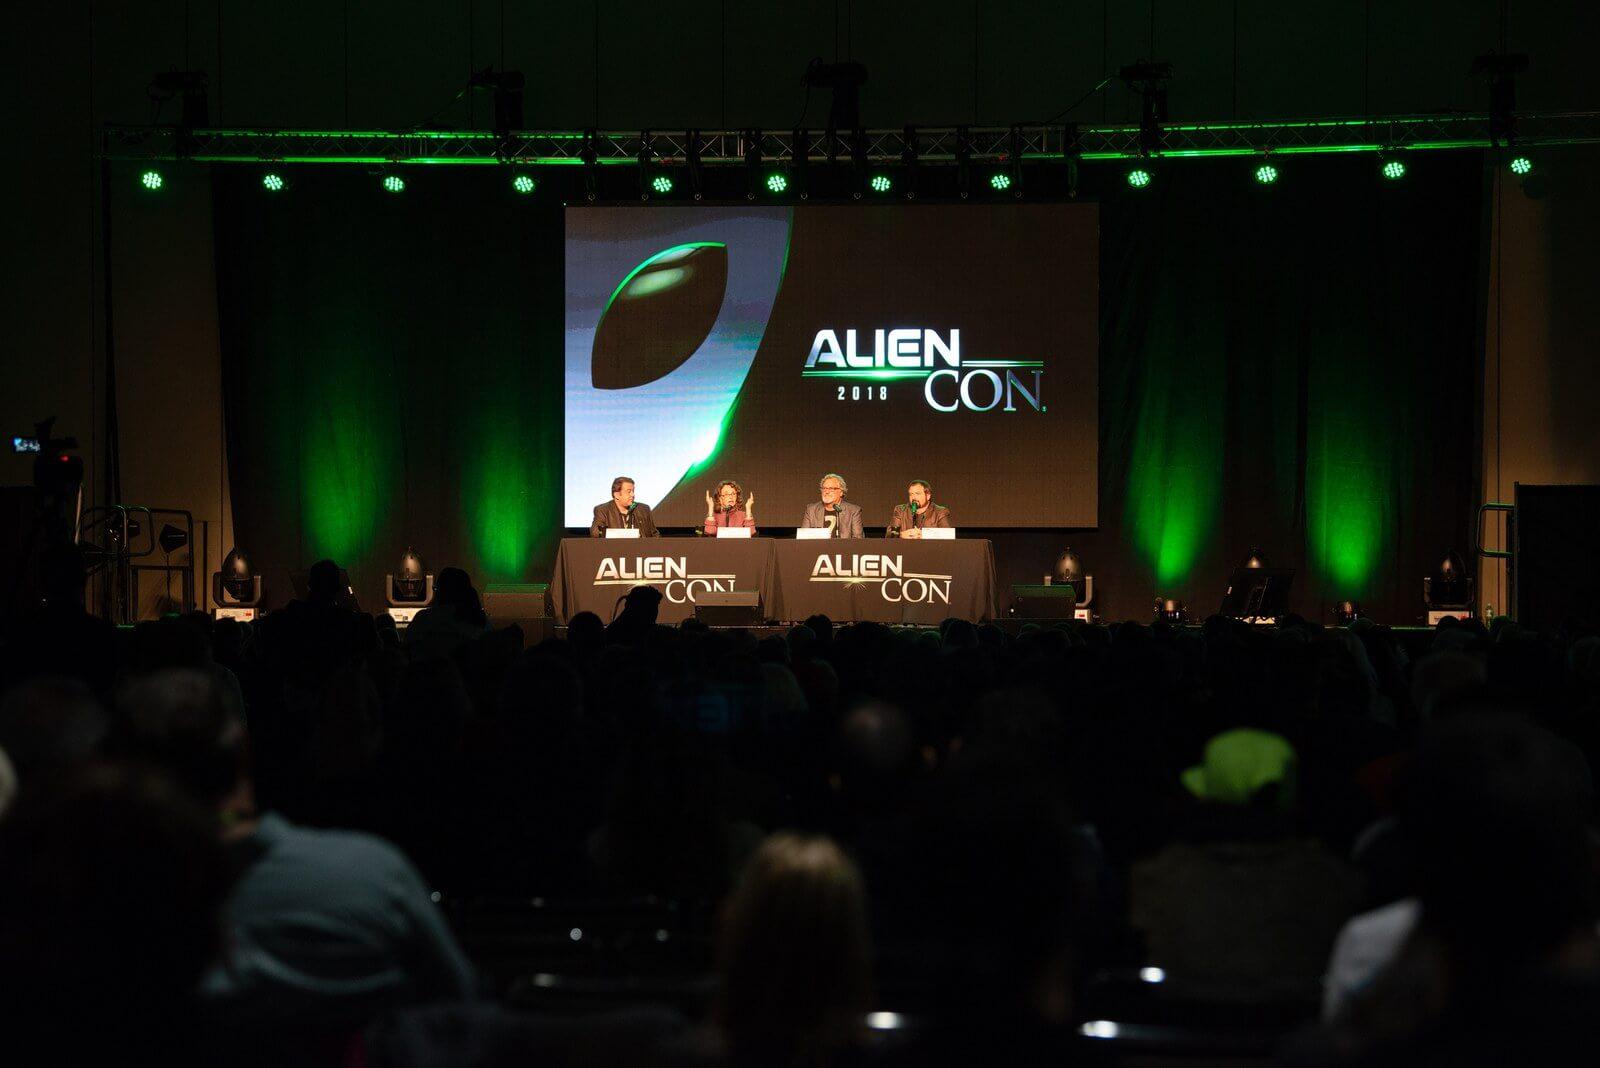 Alien Con